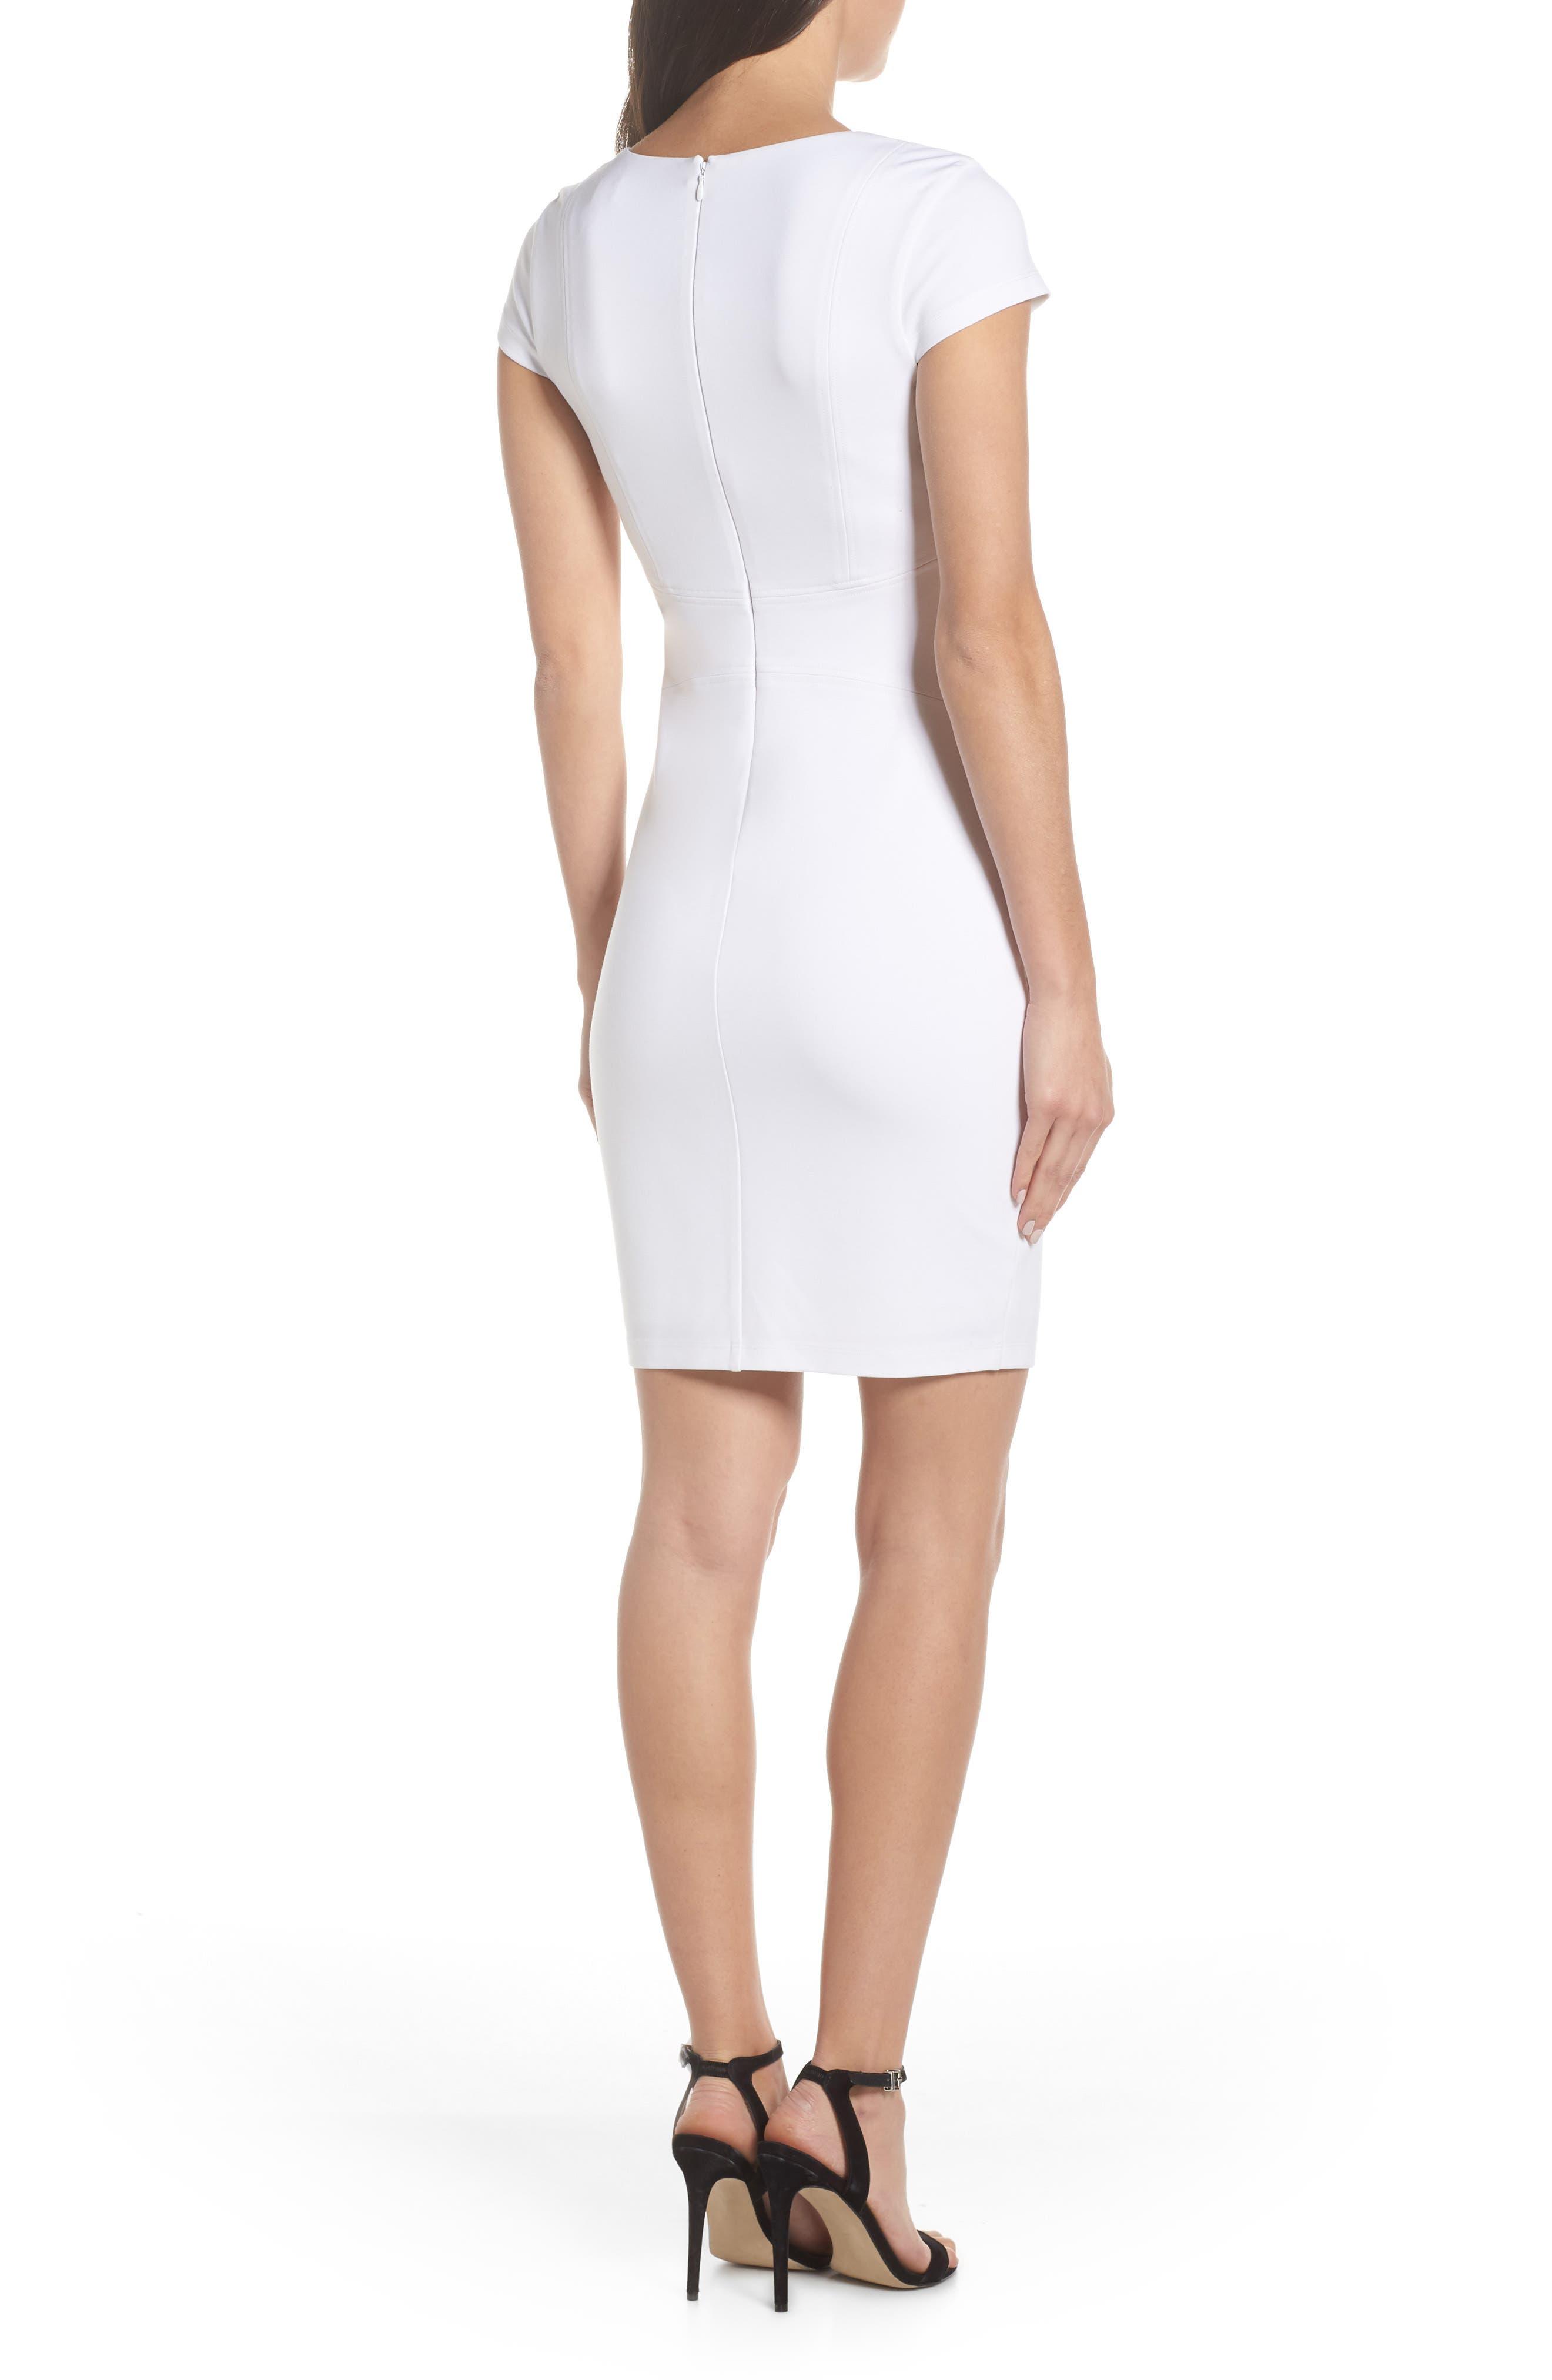 ALI & JAY, Olive Street Body-Con Dress, Alternate thumbnail 2, color, WHITE